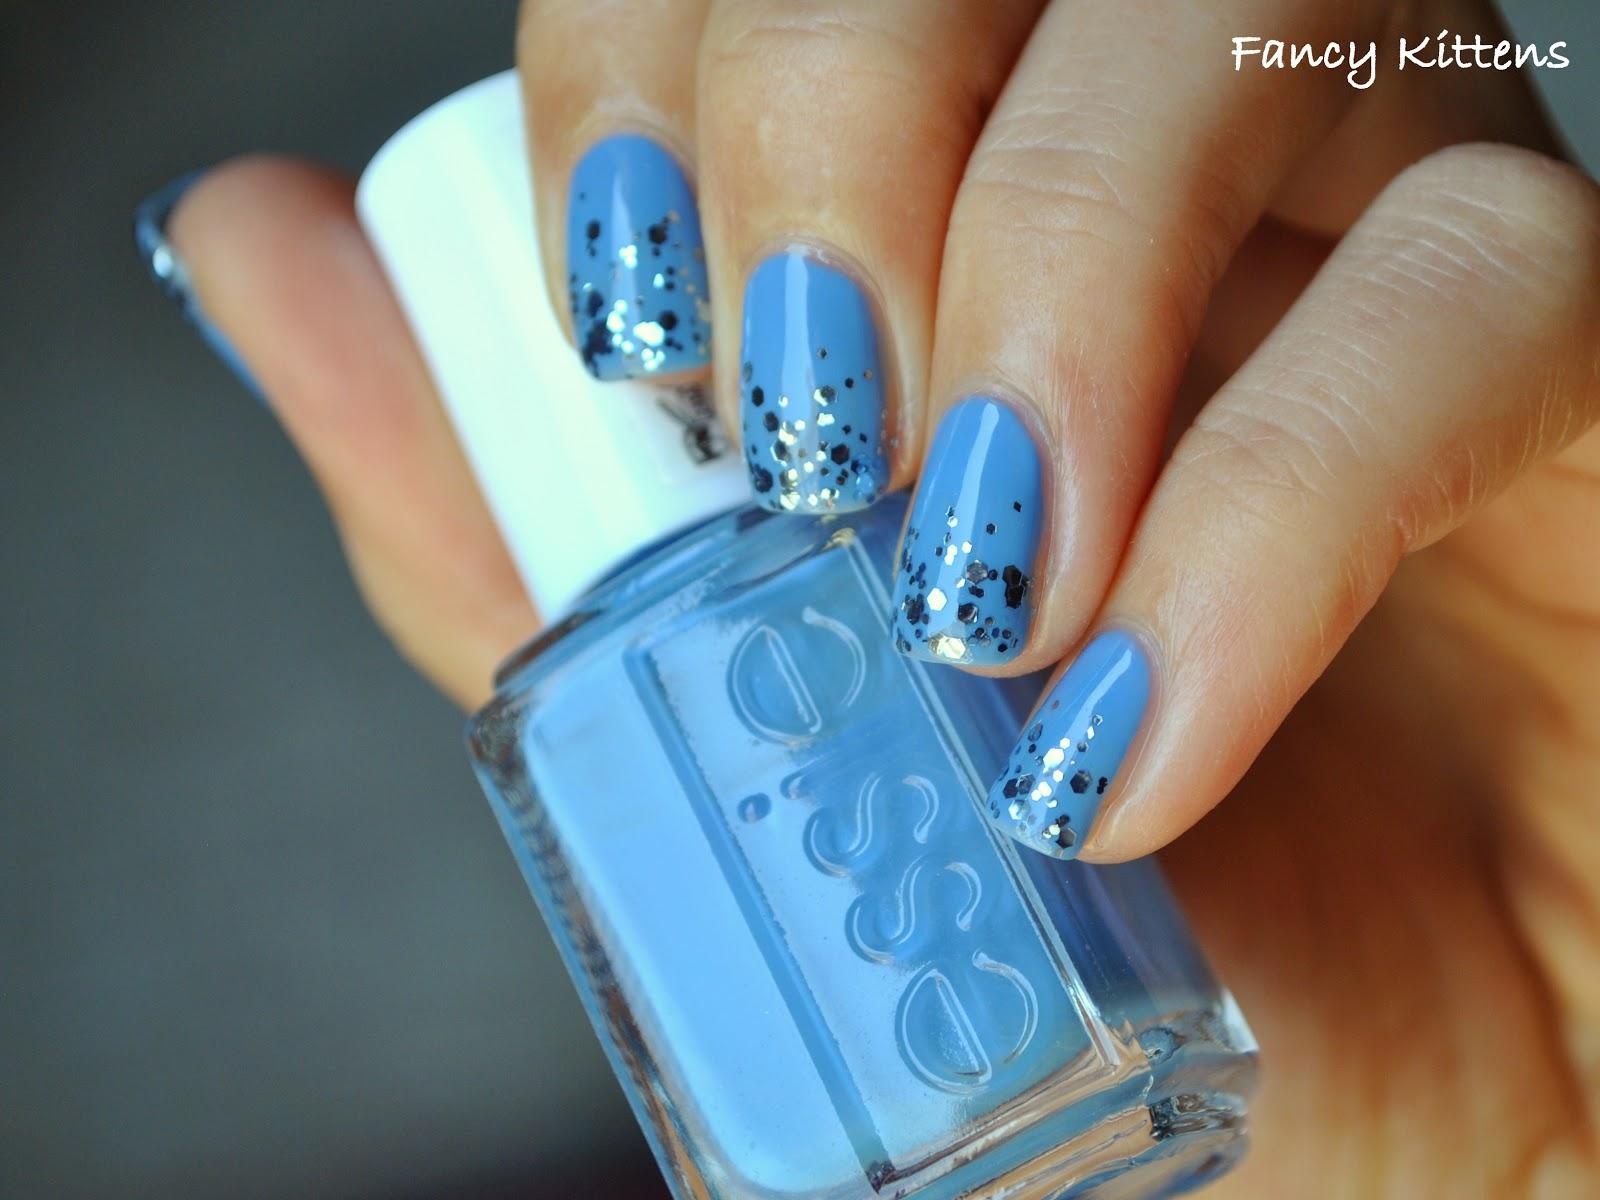 Glitter Gradient Essie - Lapiz of Luxury Catrice - 40 I'm Dynamite